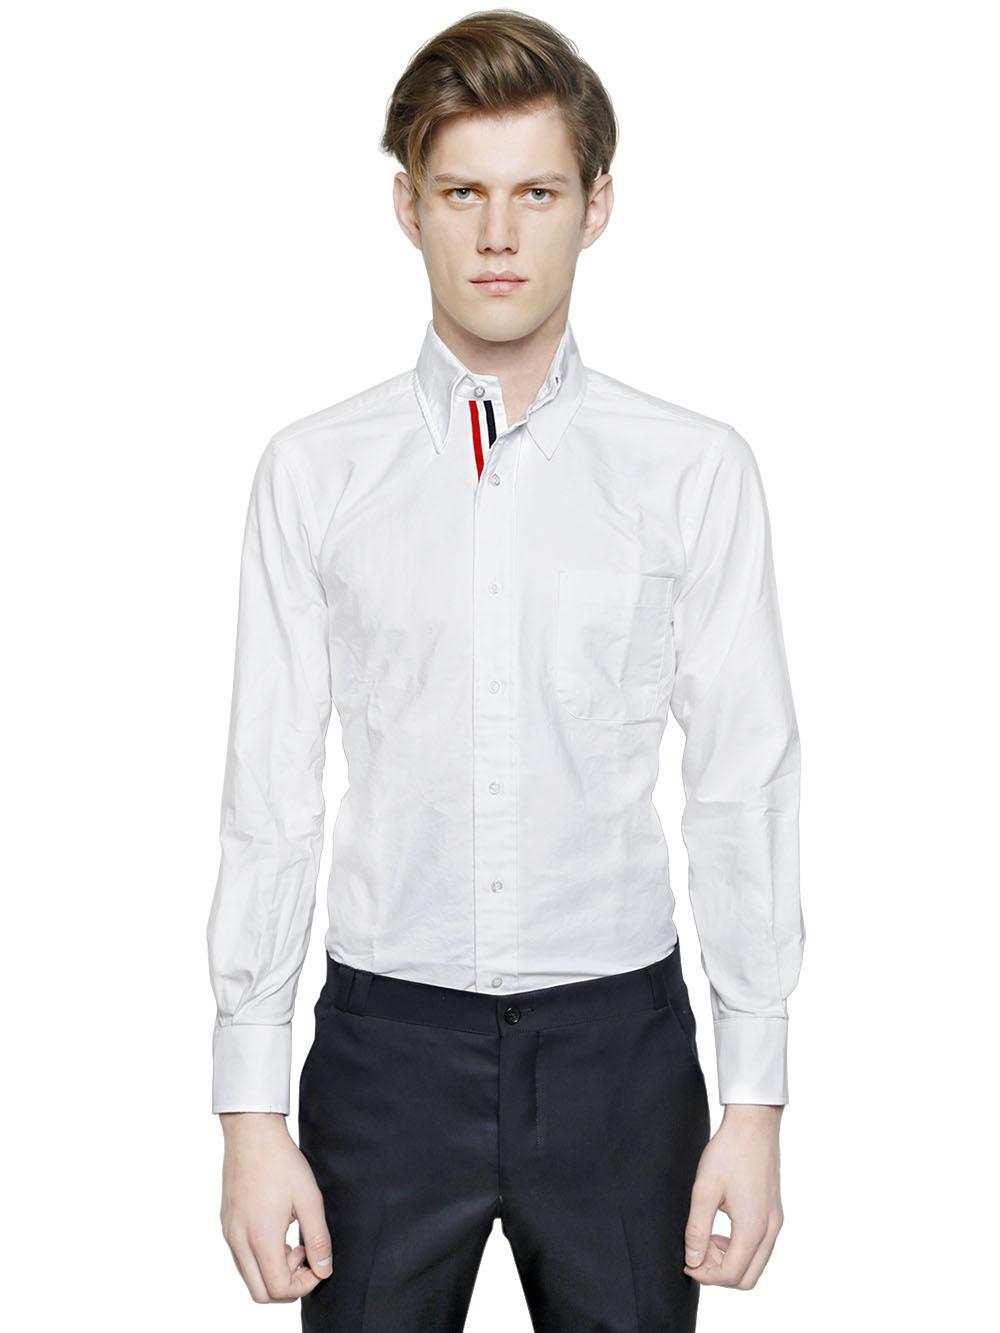 Thom browne cotton oxford shirt w grosgrain detail in for Thom browne white shirt